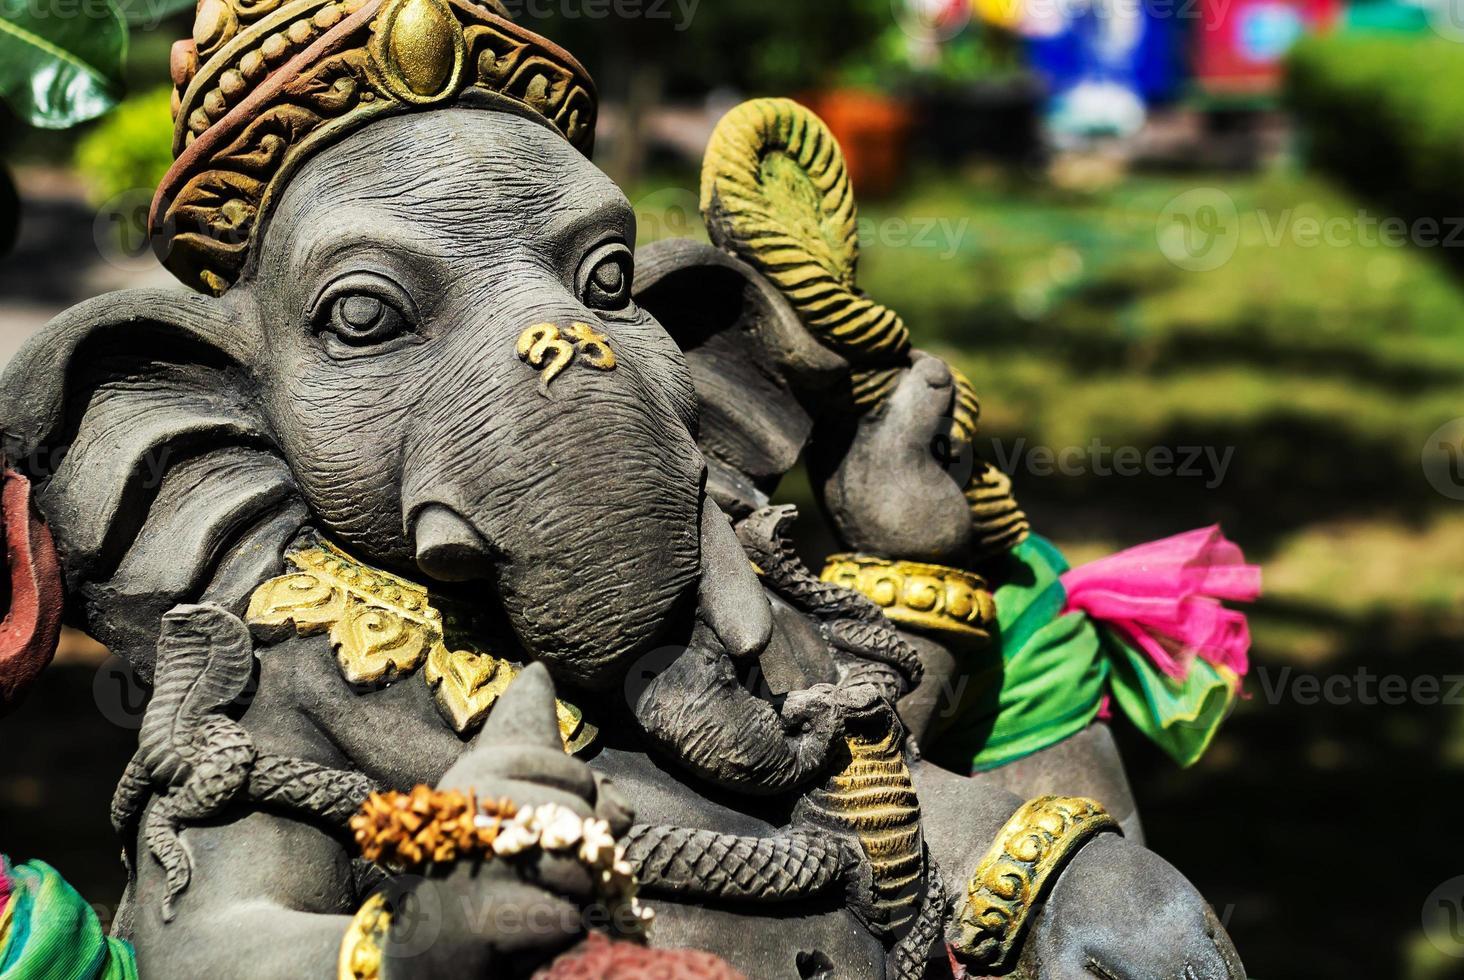 Ganesha made of stone in Thailand photo